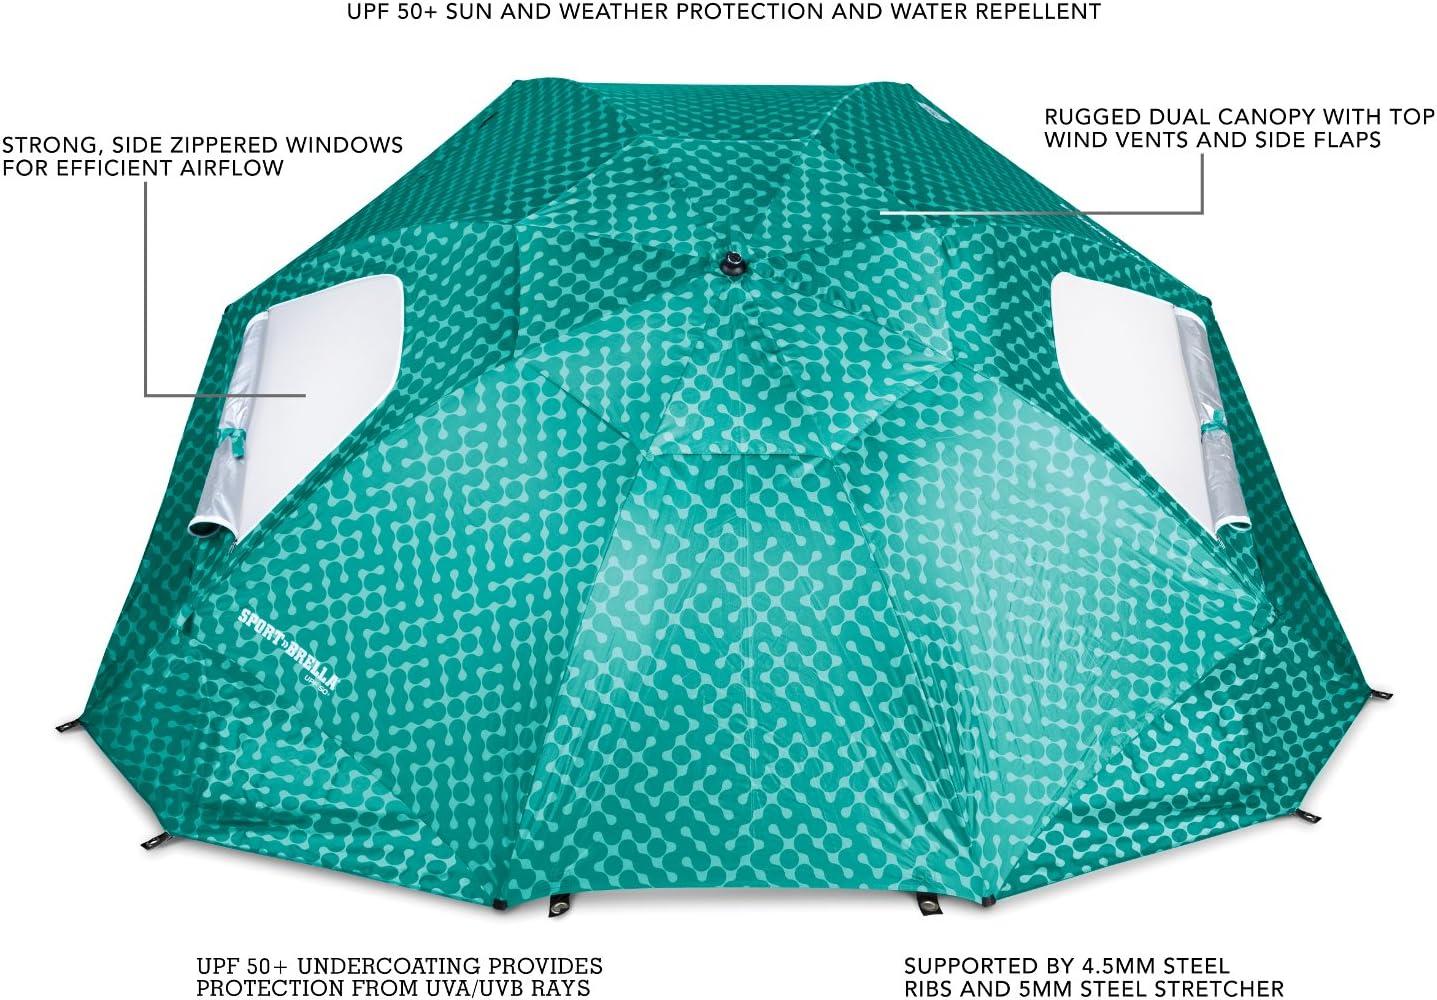 Turquoise Paraguas port/átil para Todo Tipo de Clima y Sol 8-Foot Canopy Color Turquesa Sport-Brella Portable All-Weather and Sun Umbrella Unisex Adulto Talla /única 8 pies